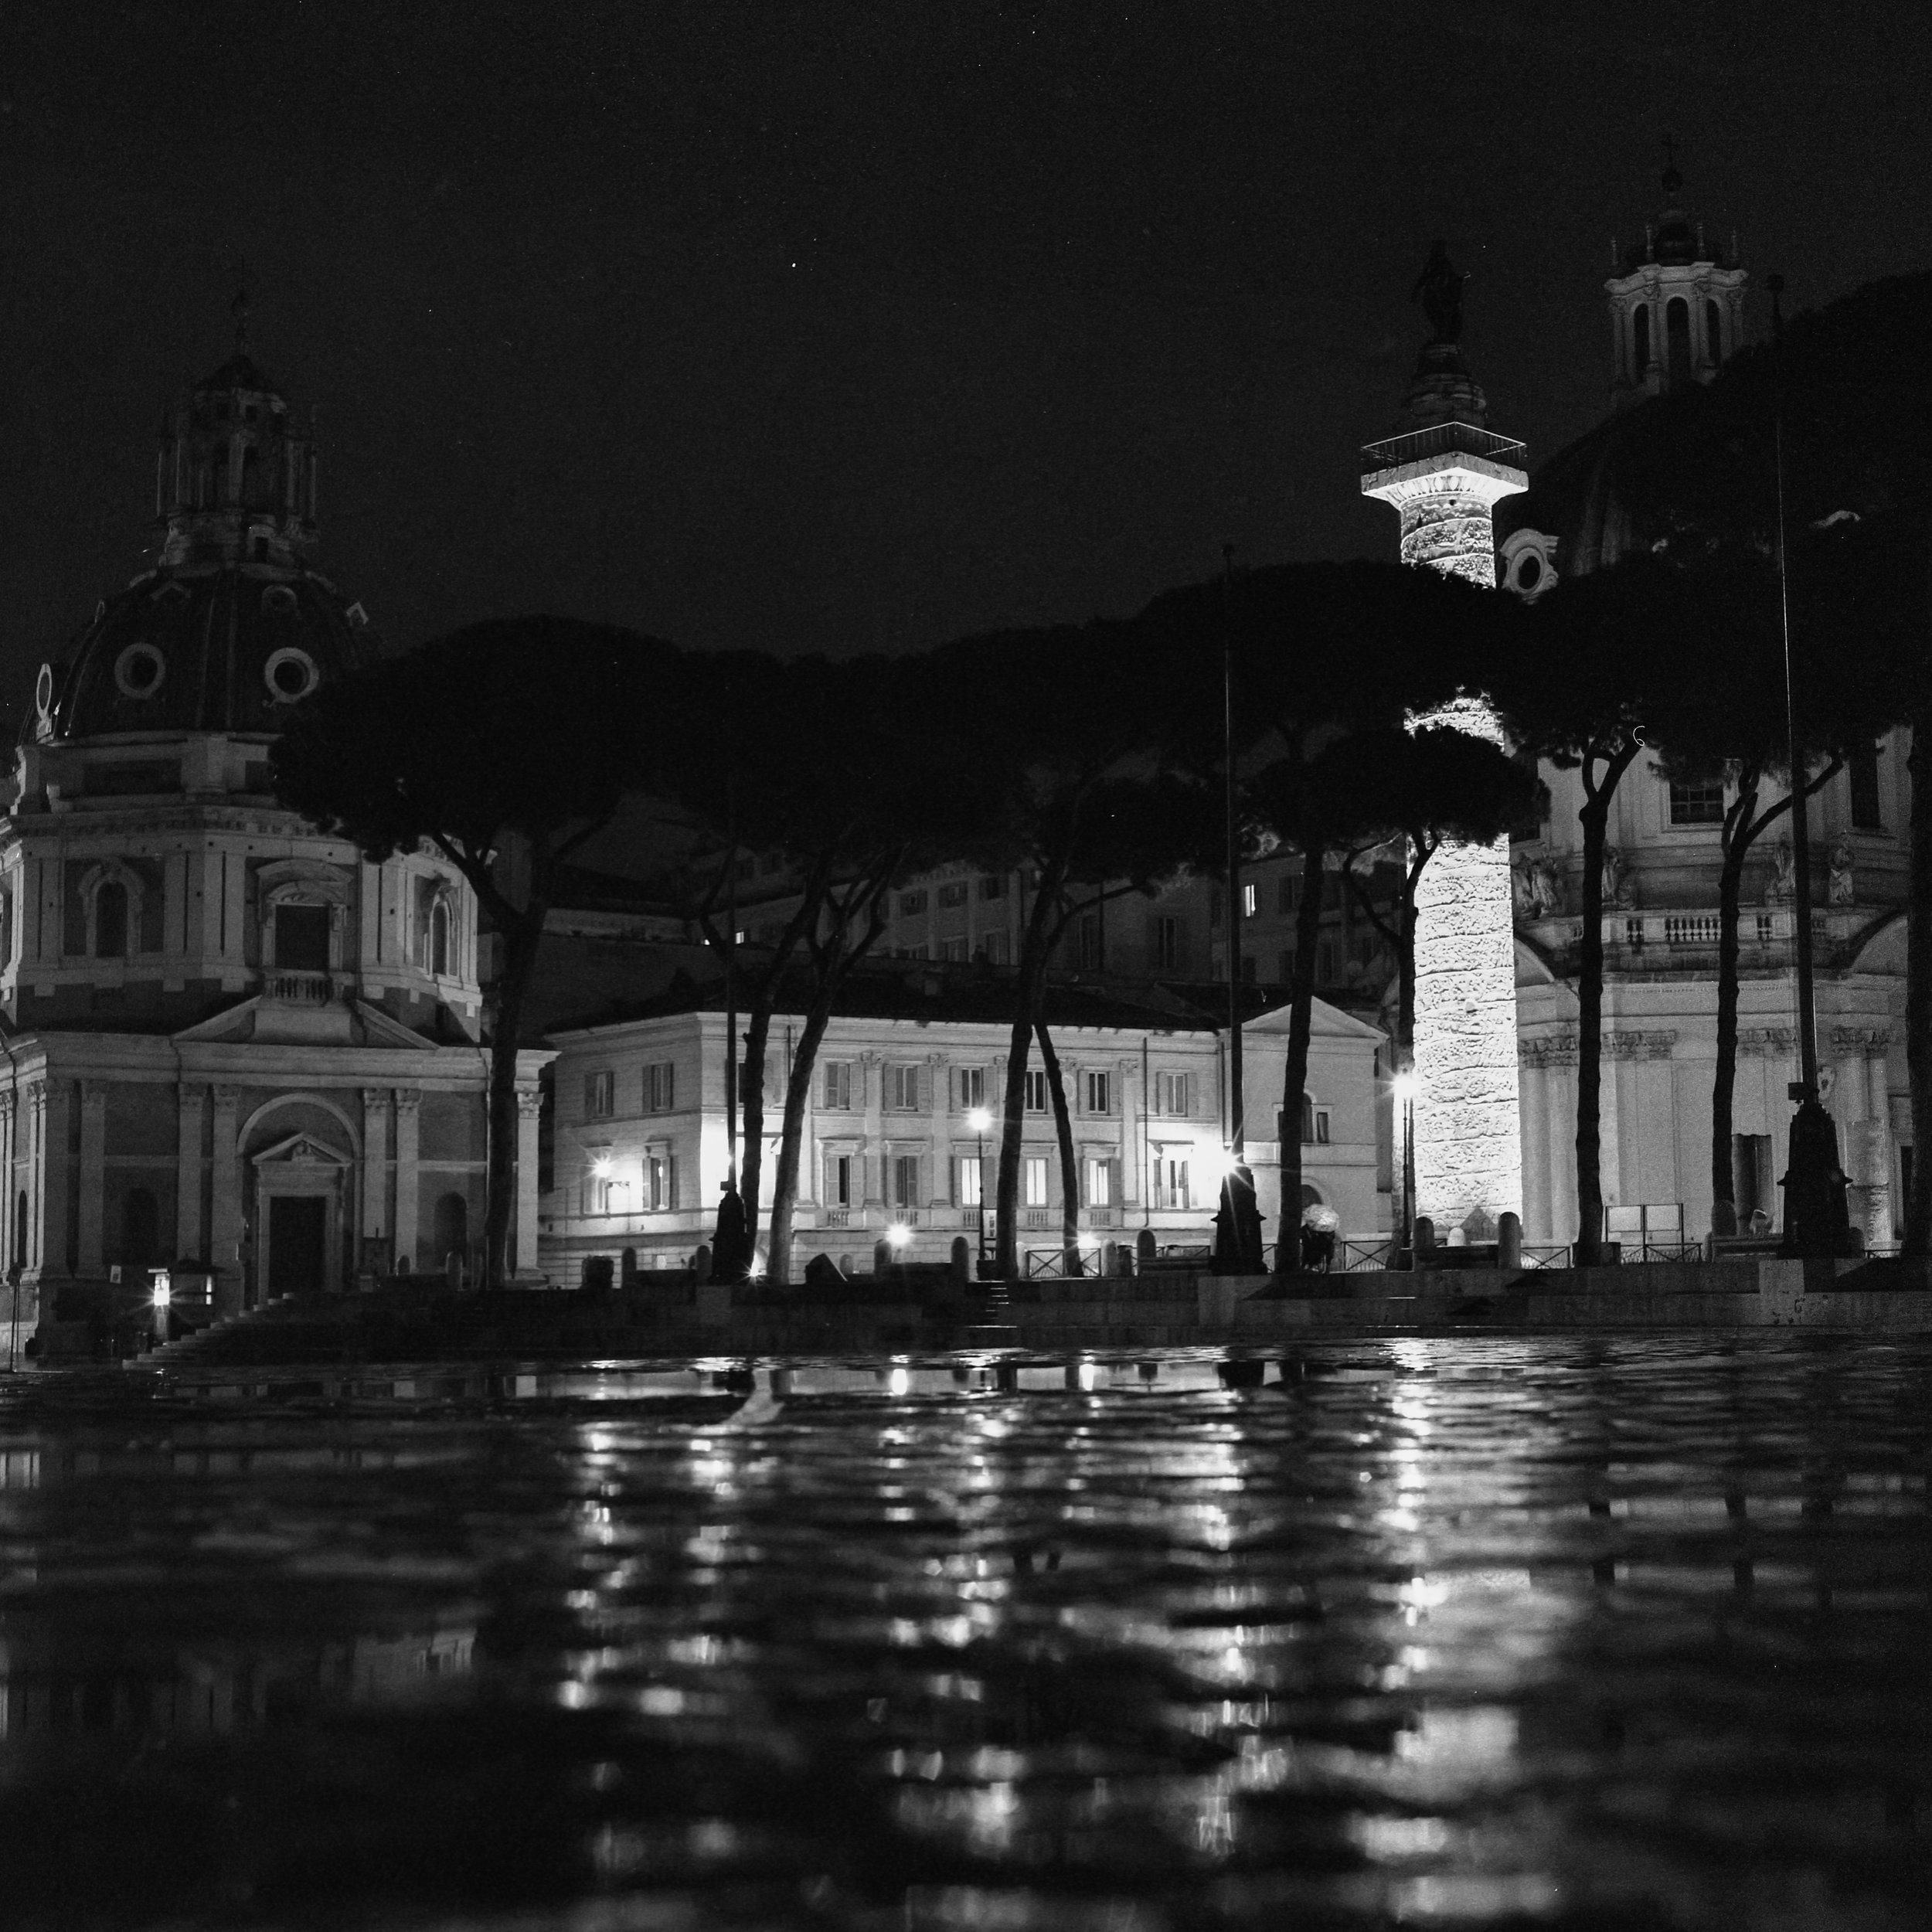 Rome Hasselblad 501c | Bergger Pancro 400